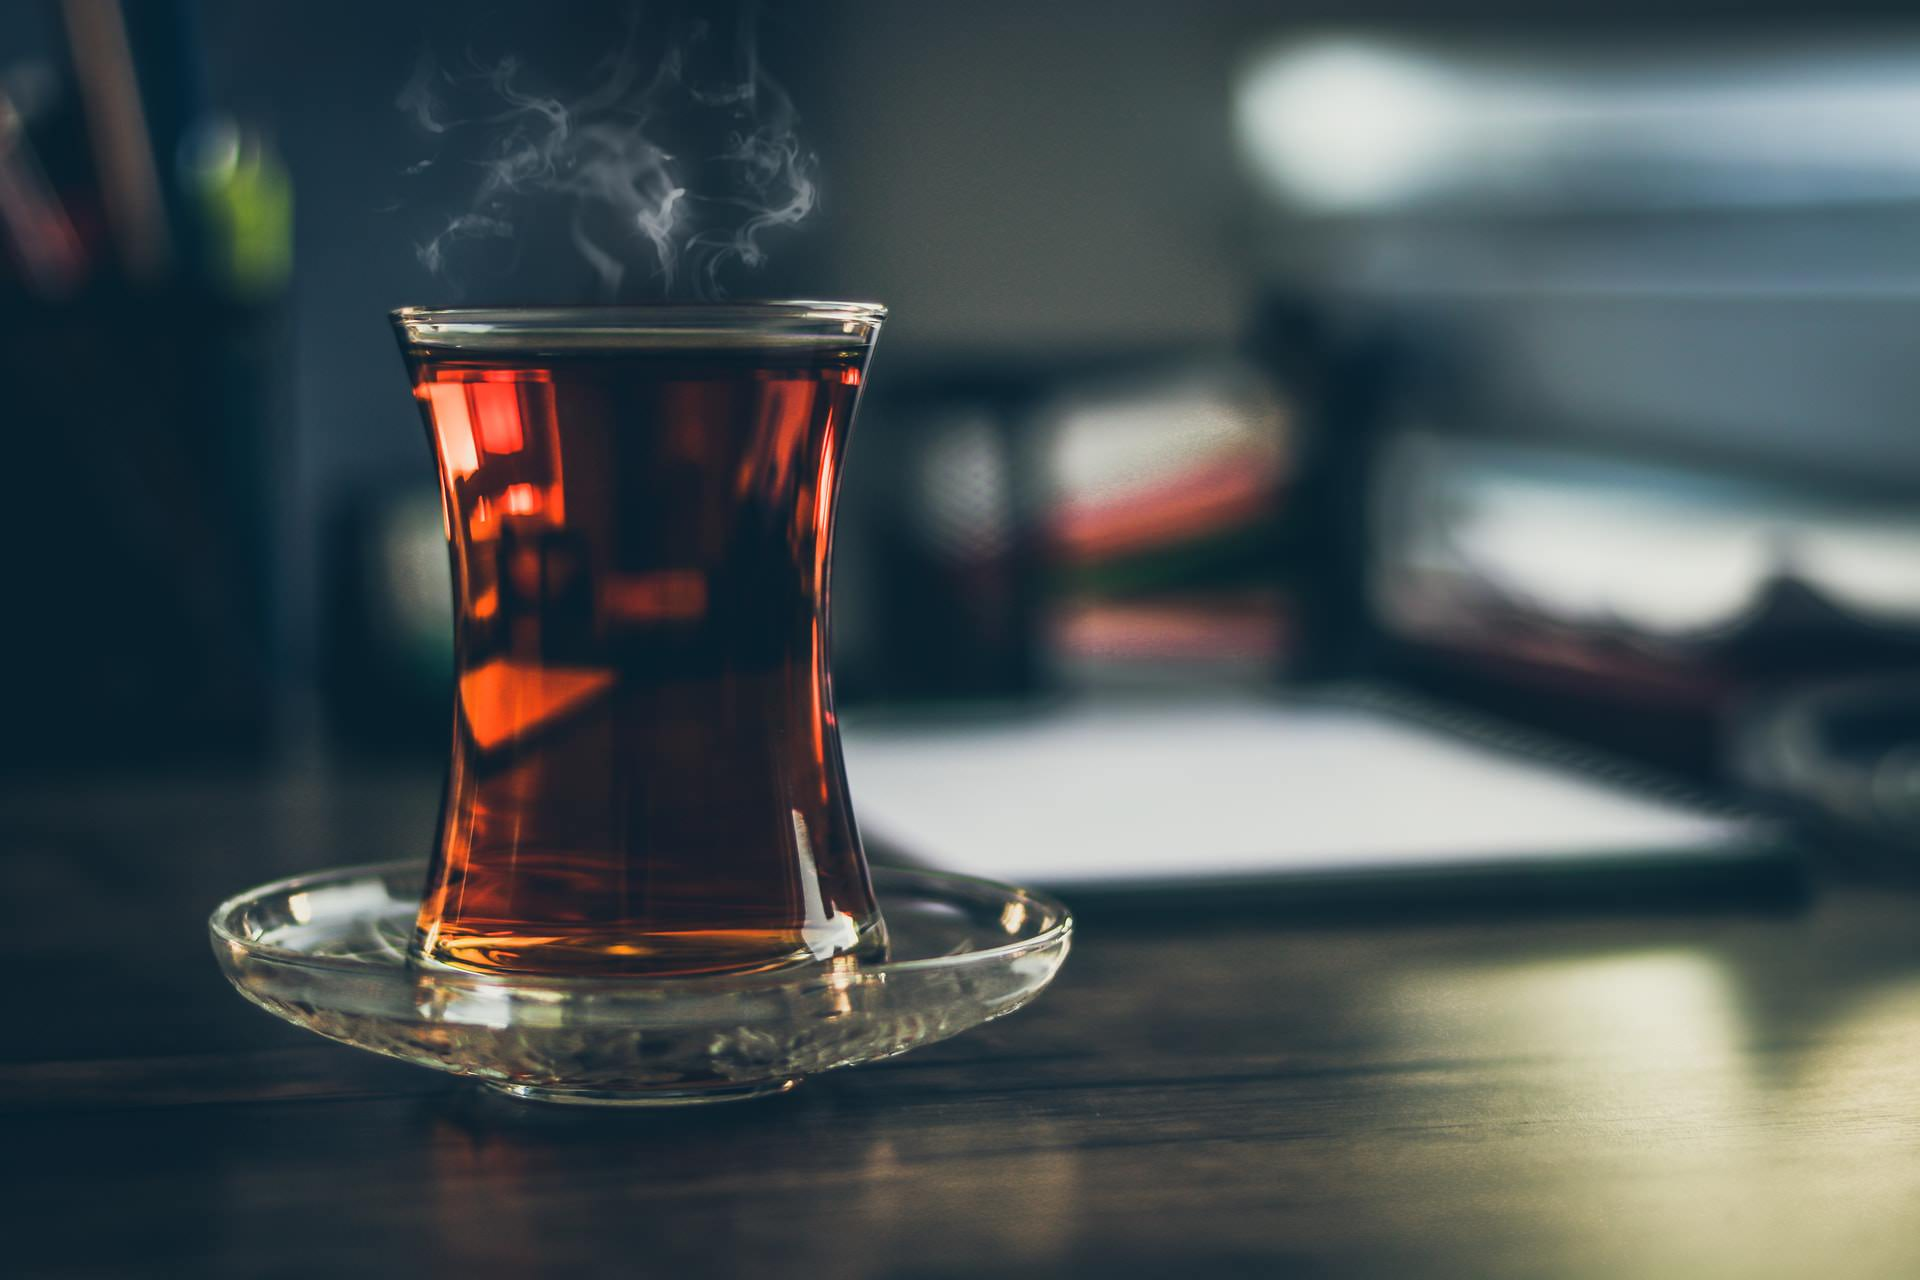 earl grey tea with bergamot oil